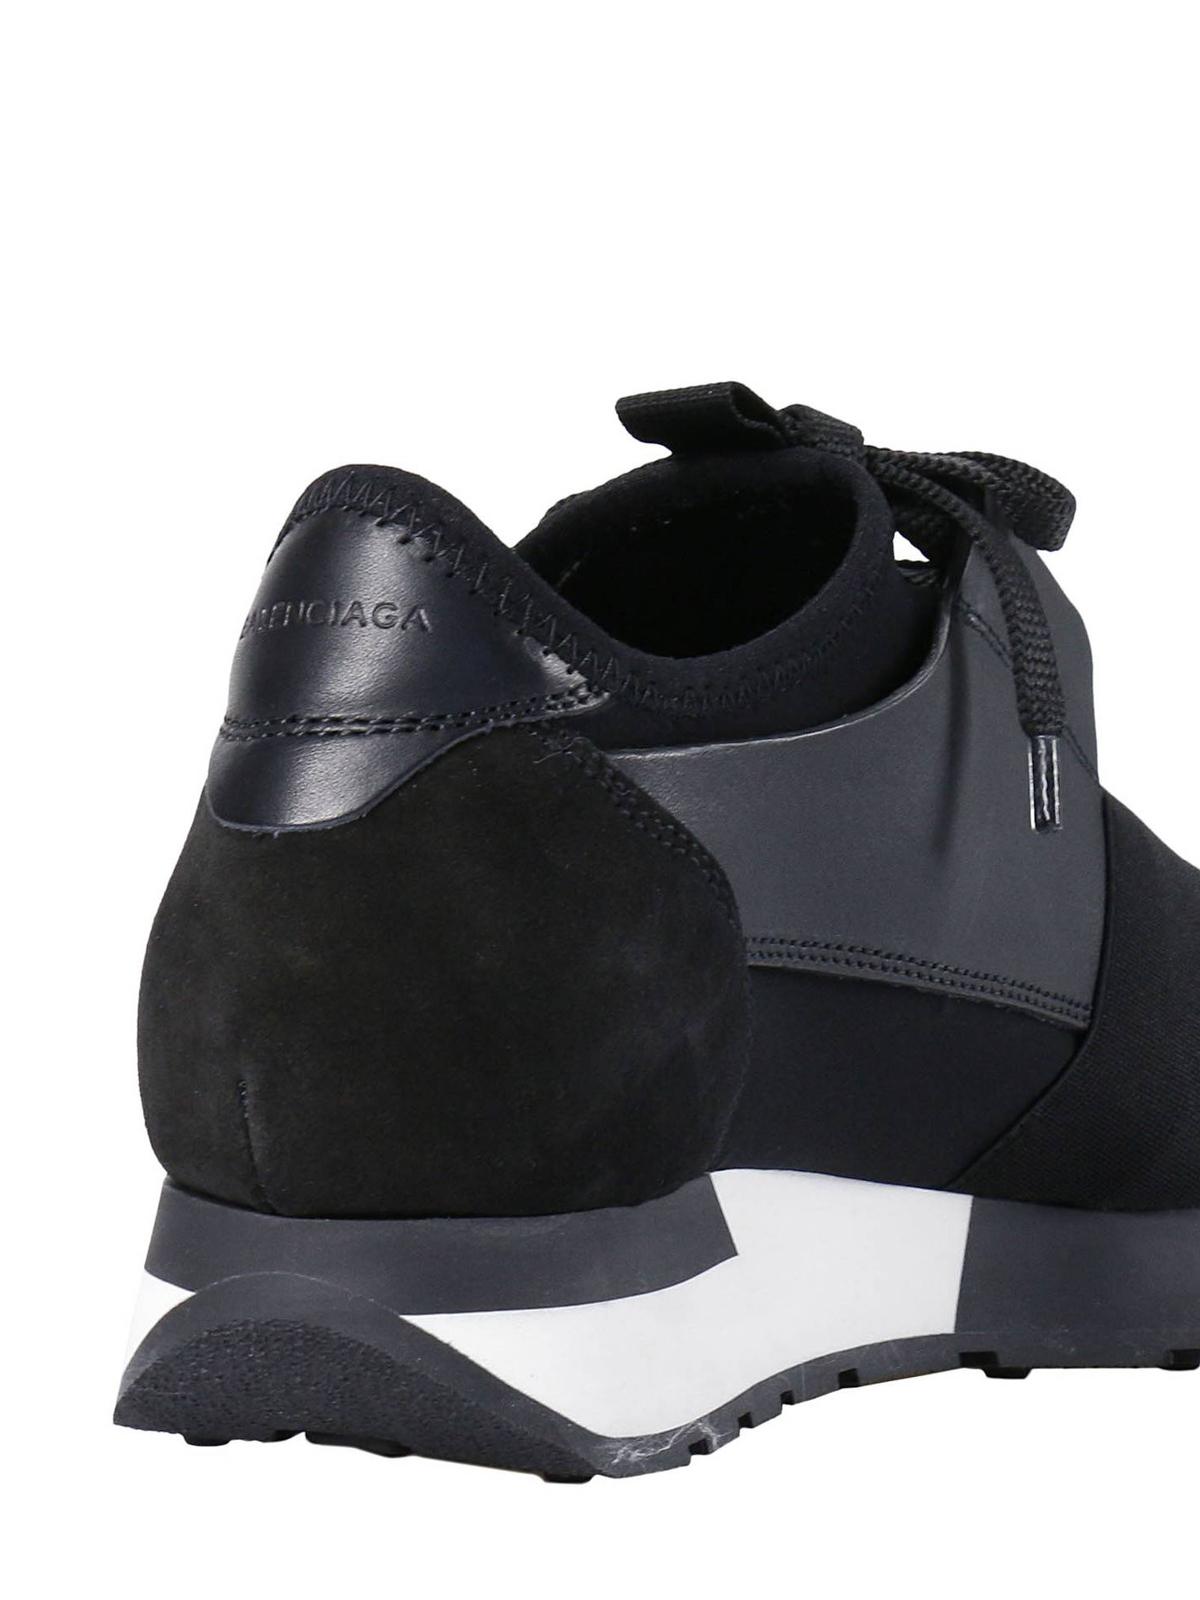 a1f4eba37e86 Balenciaga - Race Runners sneakers - trainers - 477283W0YX41000